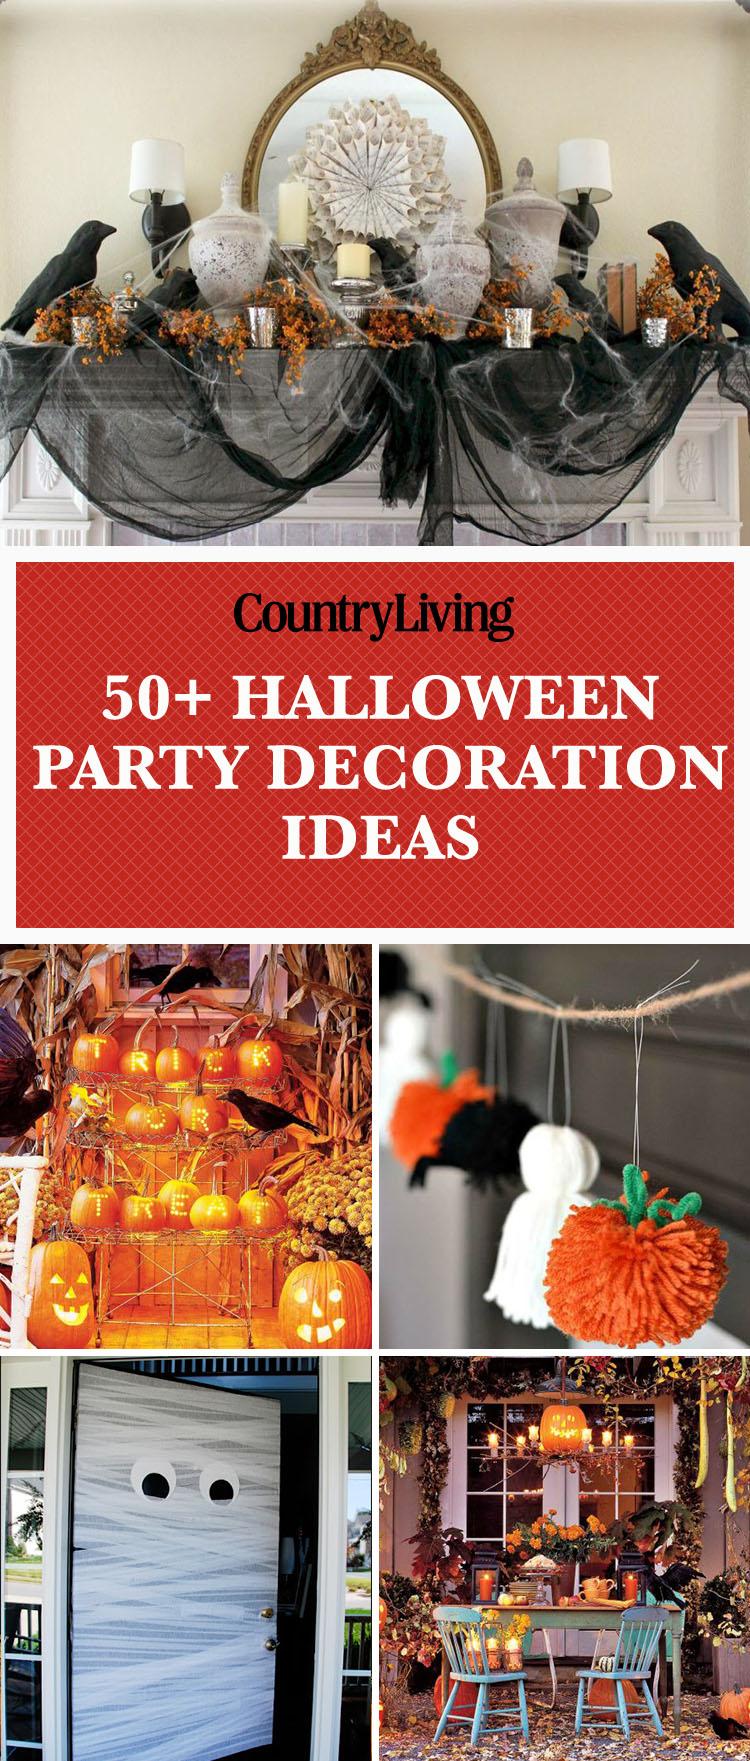 56 Fun Halloween Party Decorating Ideas - Spooky Halloween ...